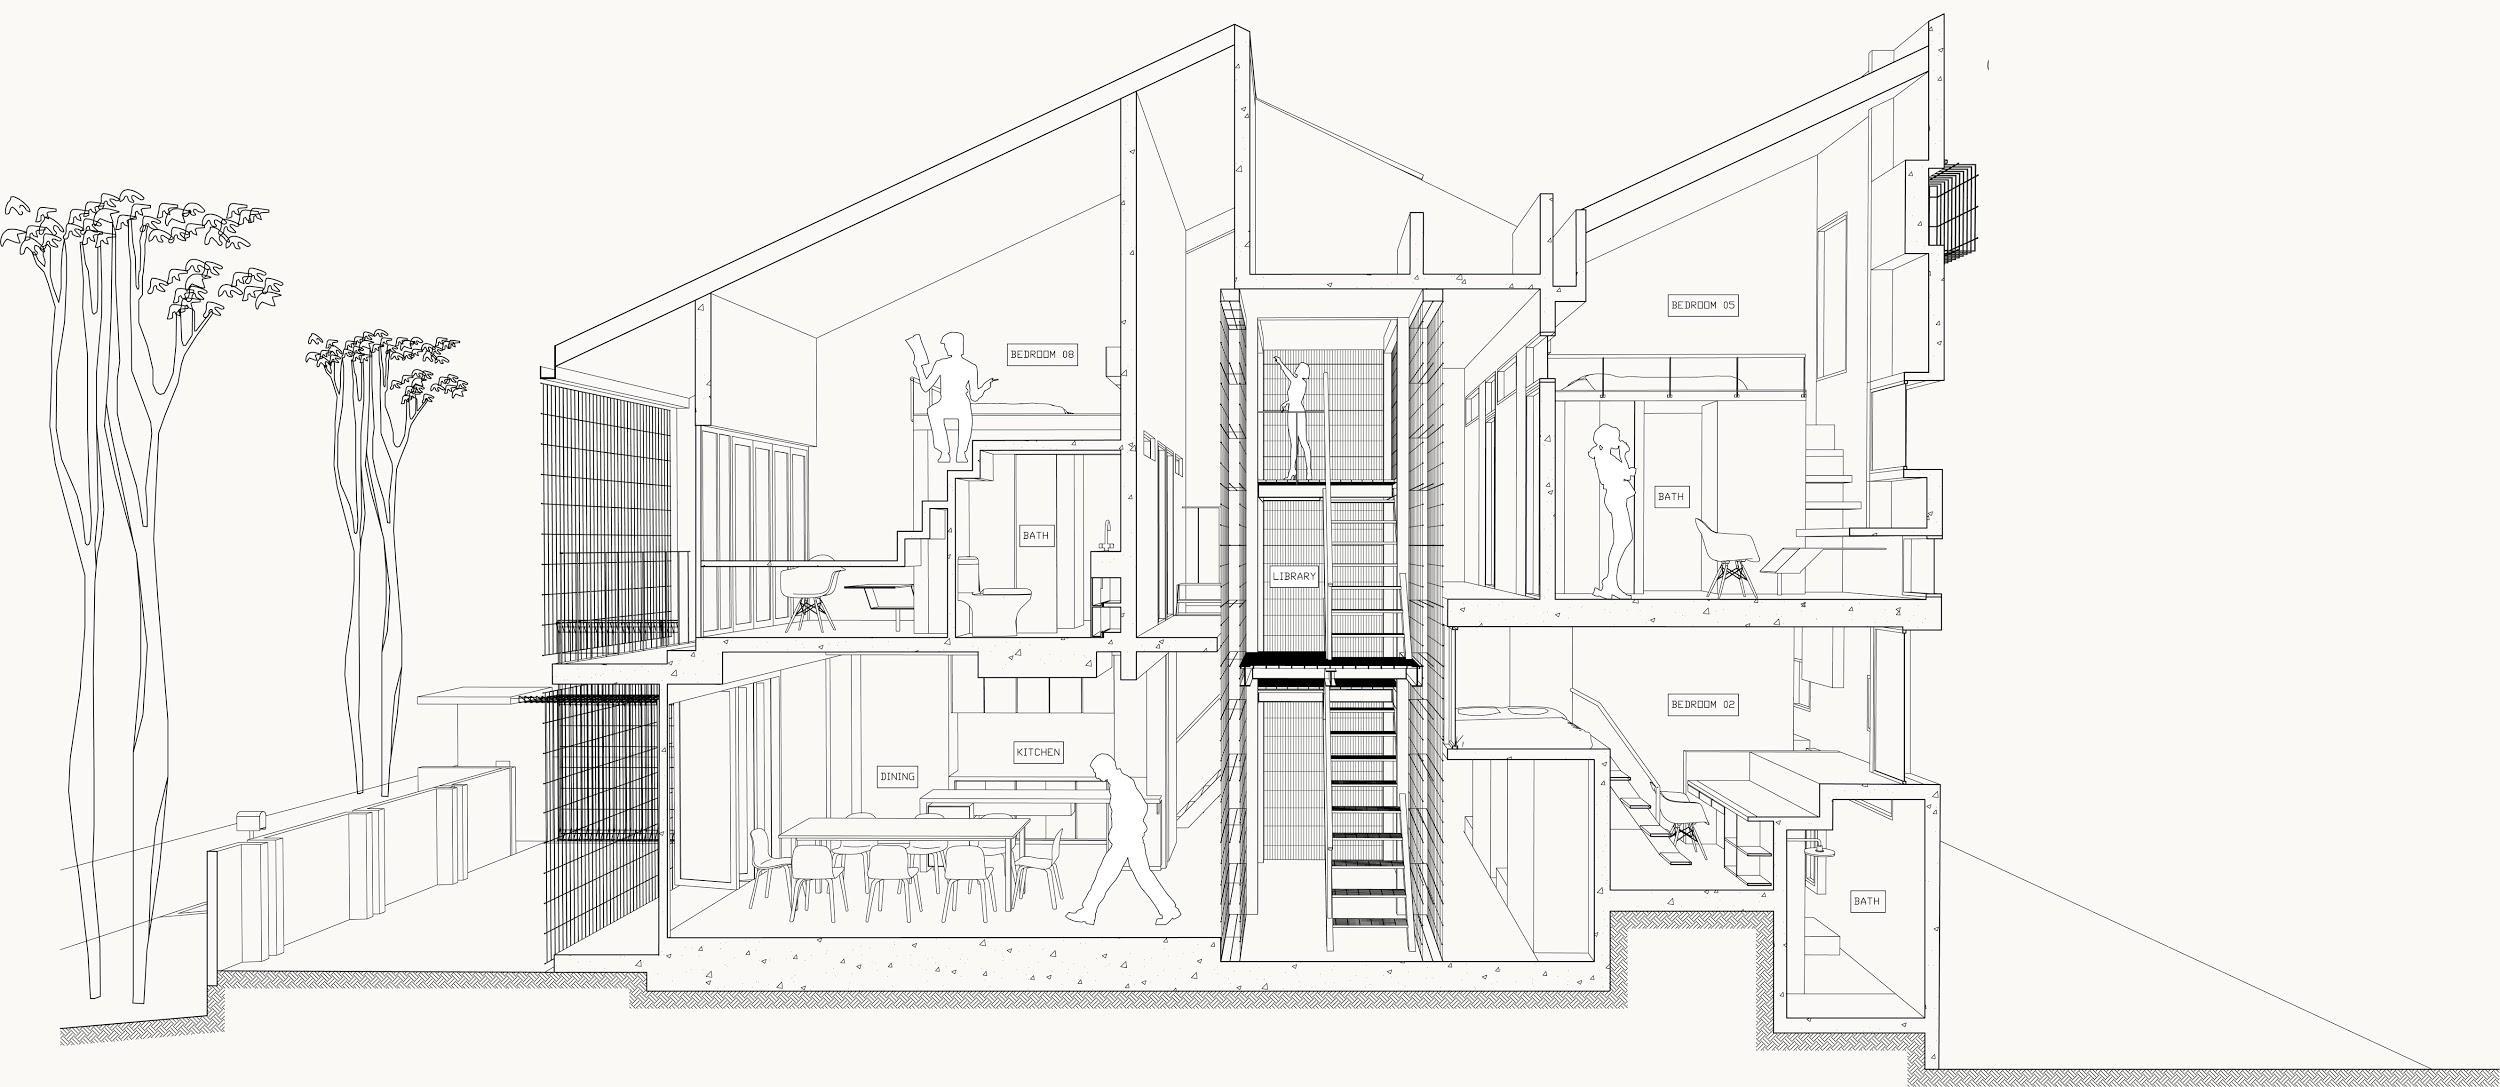 L45 Student Hostel + Library, Image © Tetawowe Atelier - art4d